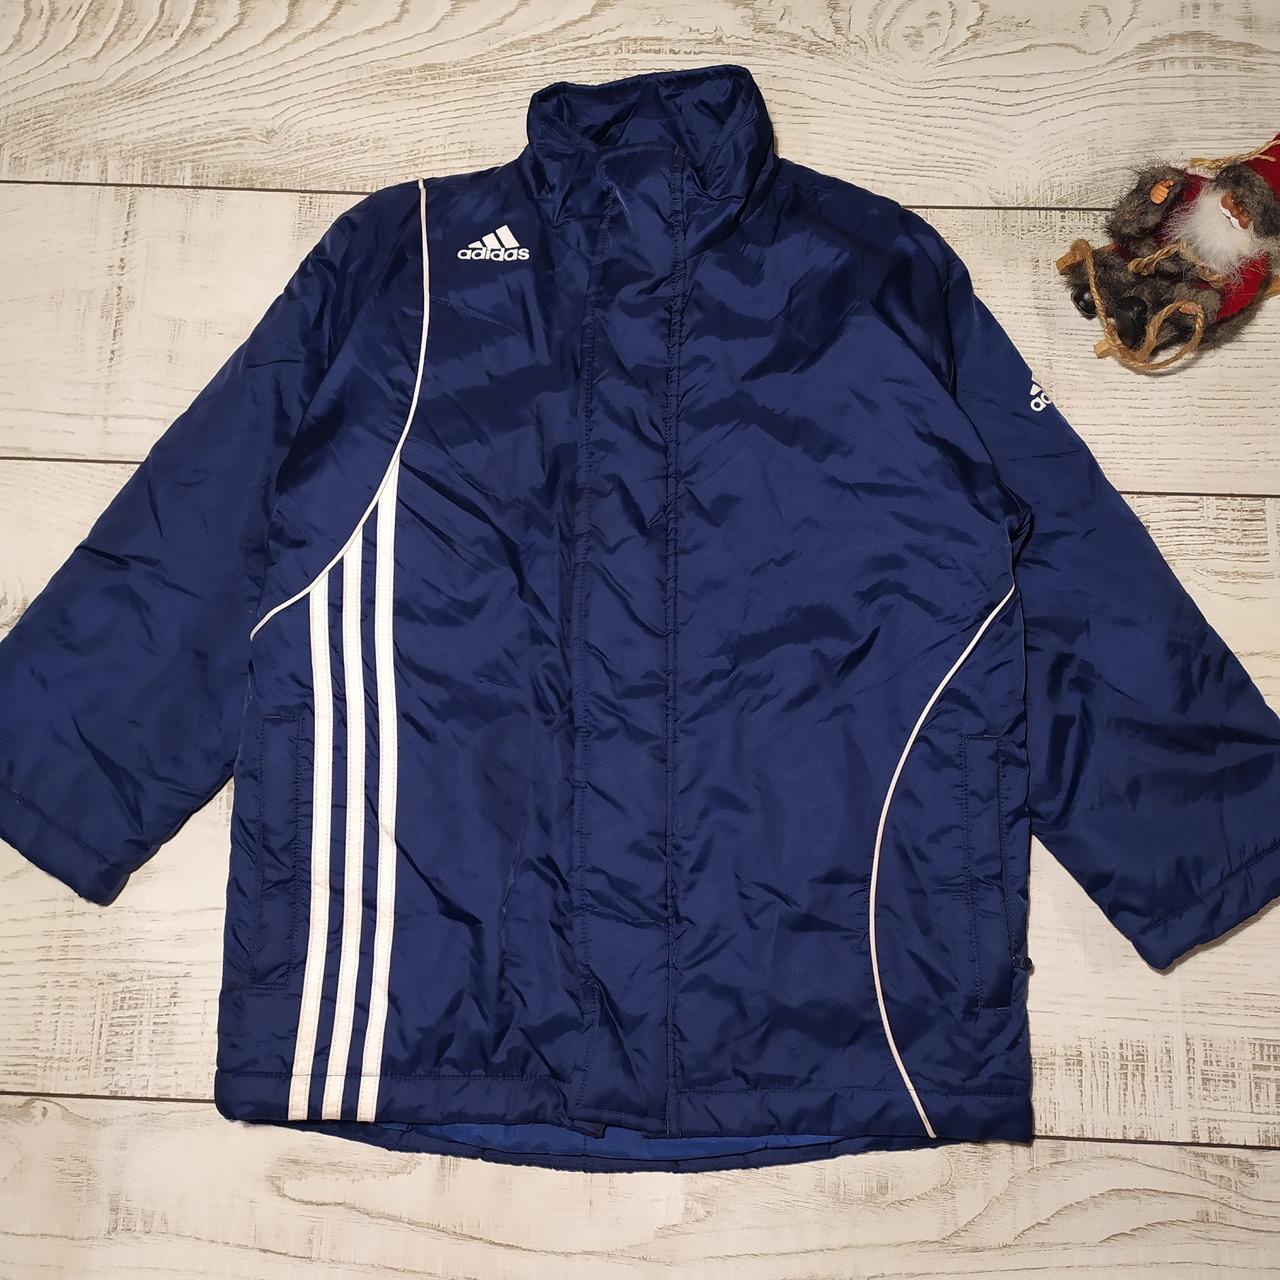 Куртка Adidas 6 лет